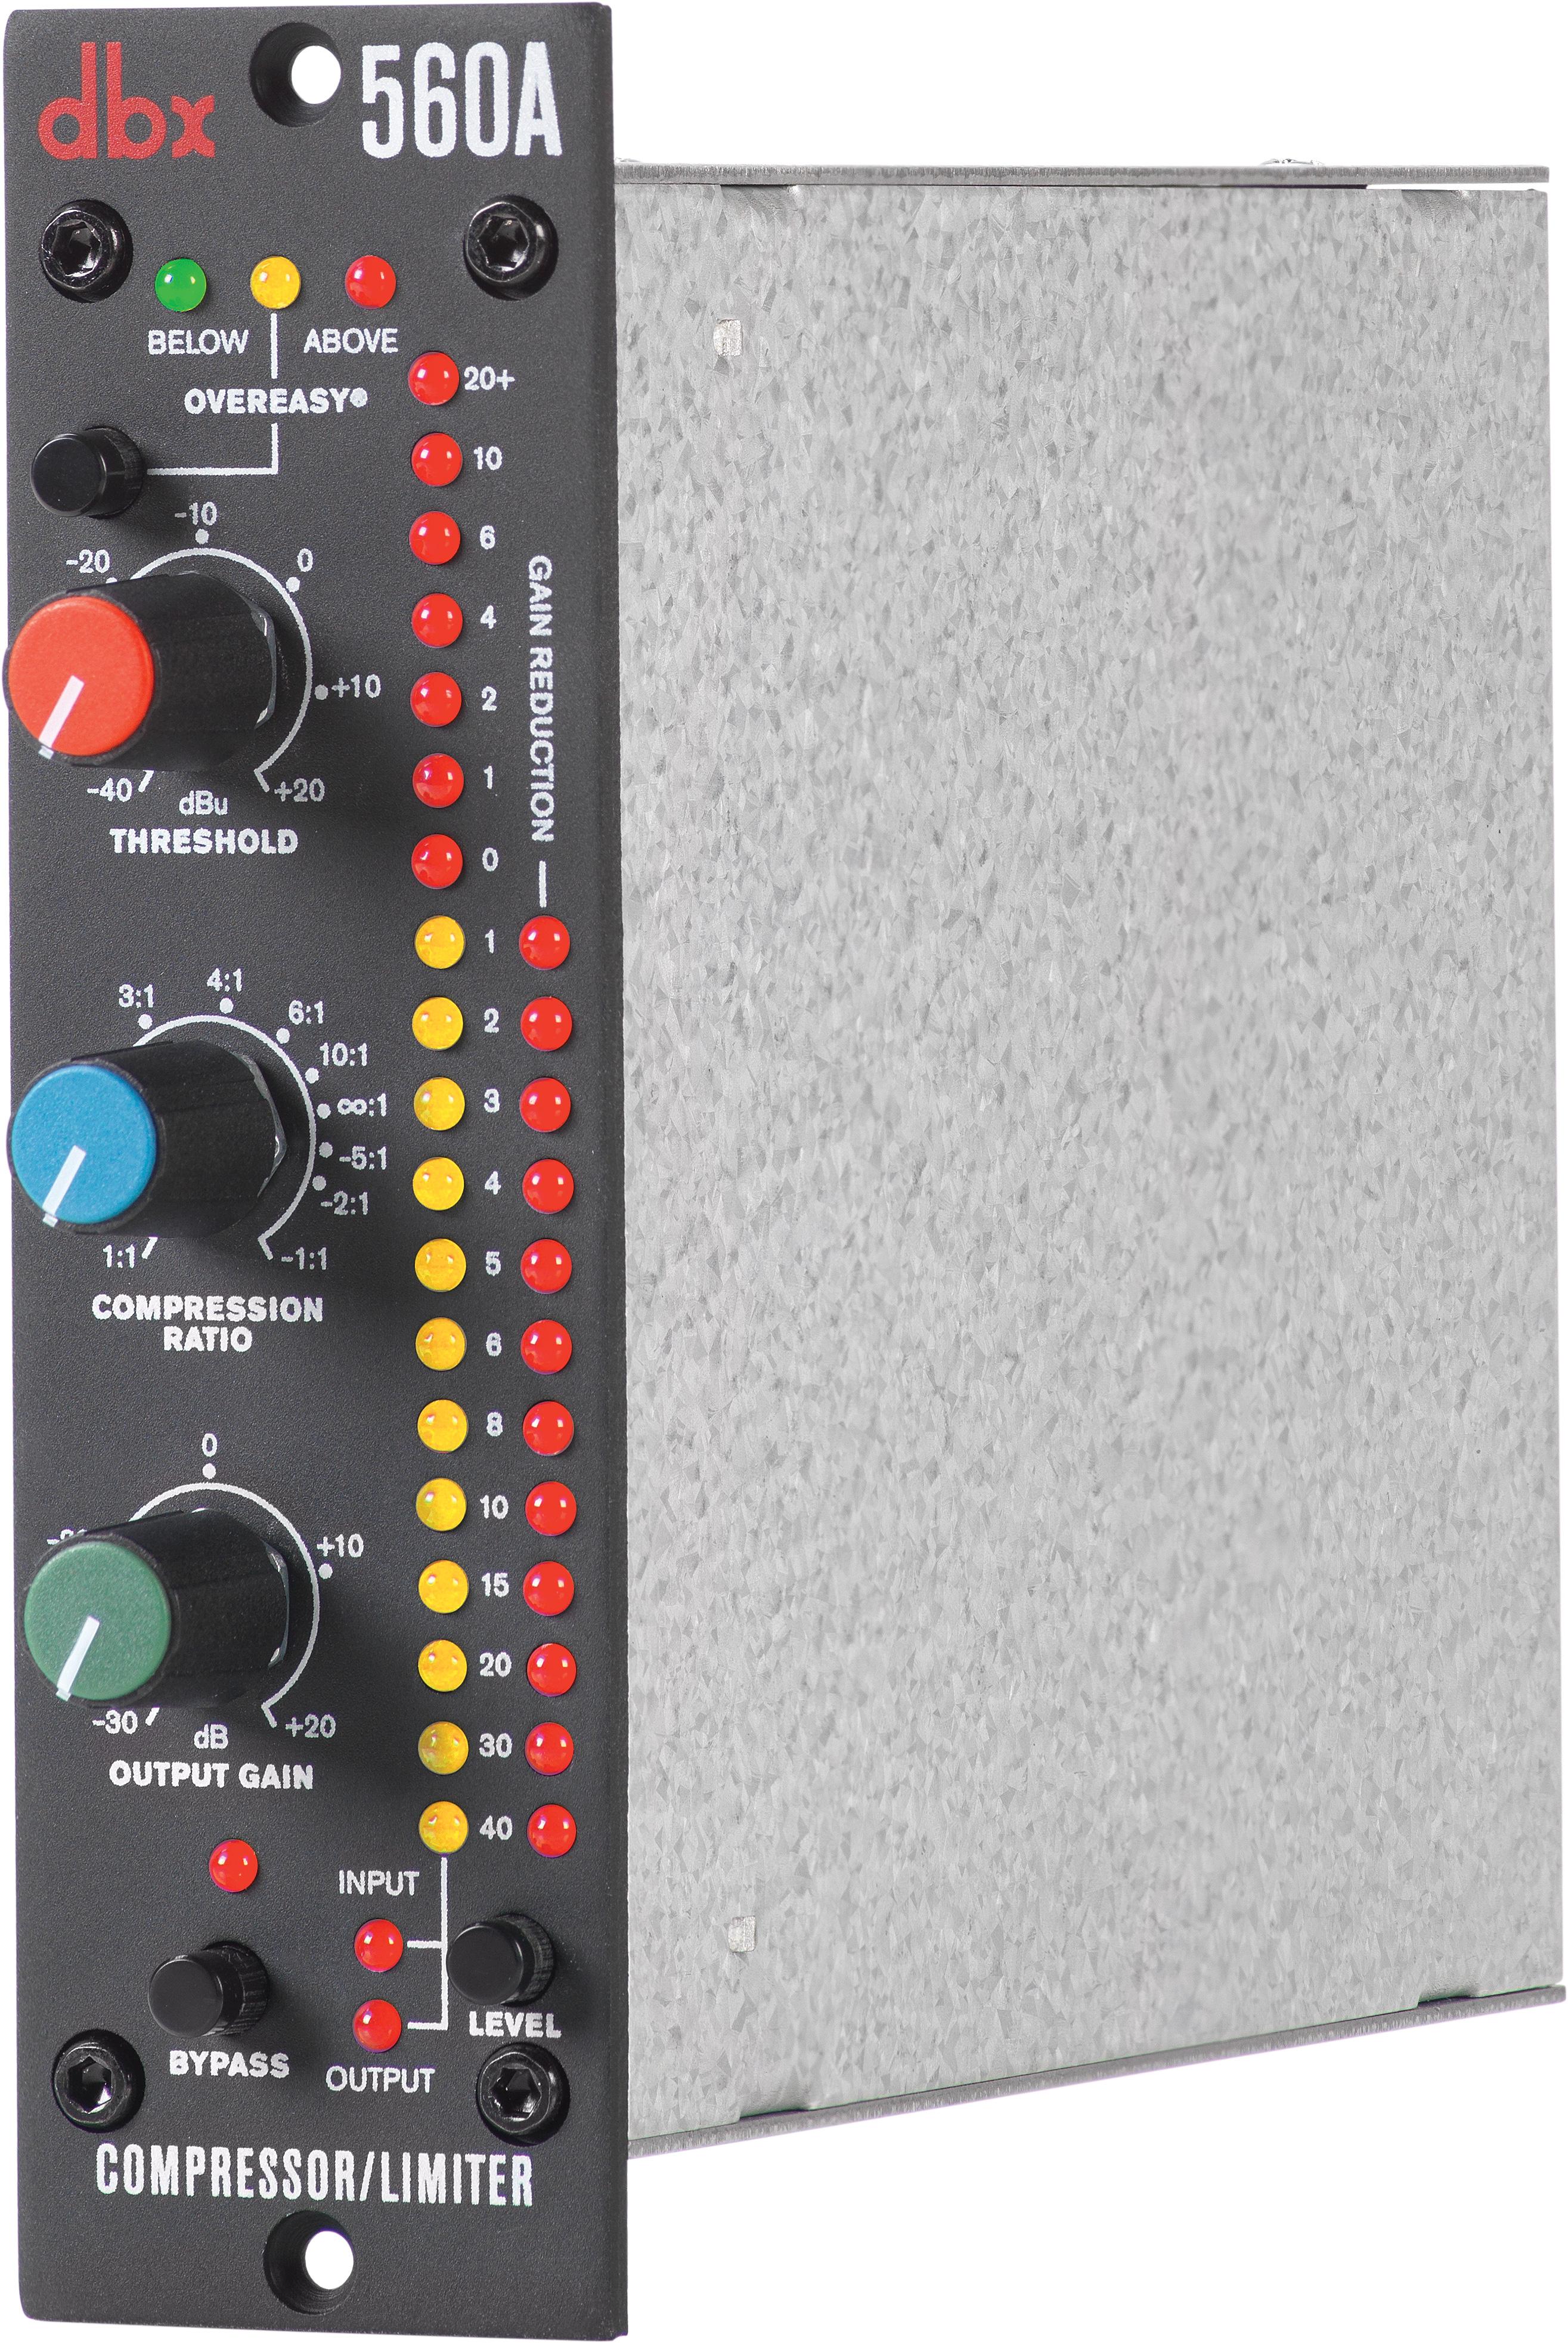 Alesis 3632 compressor manual